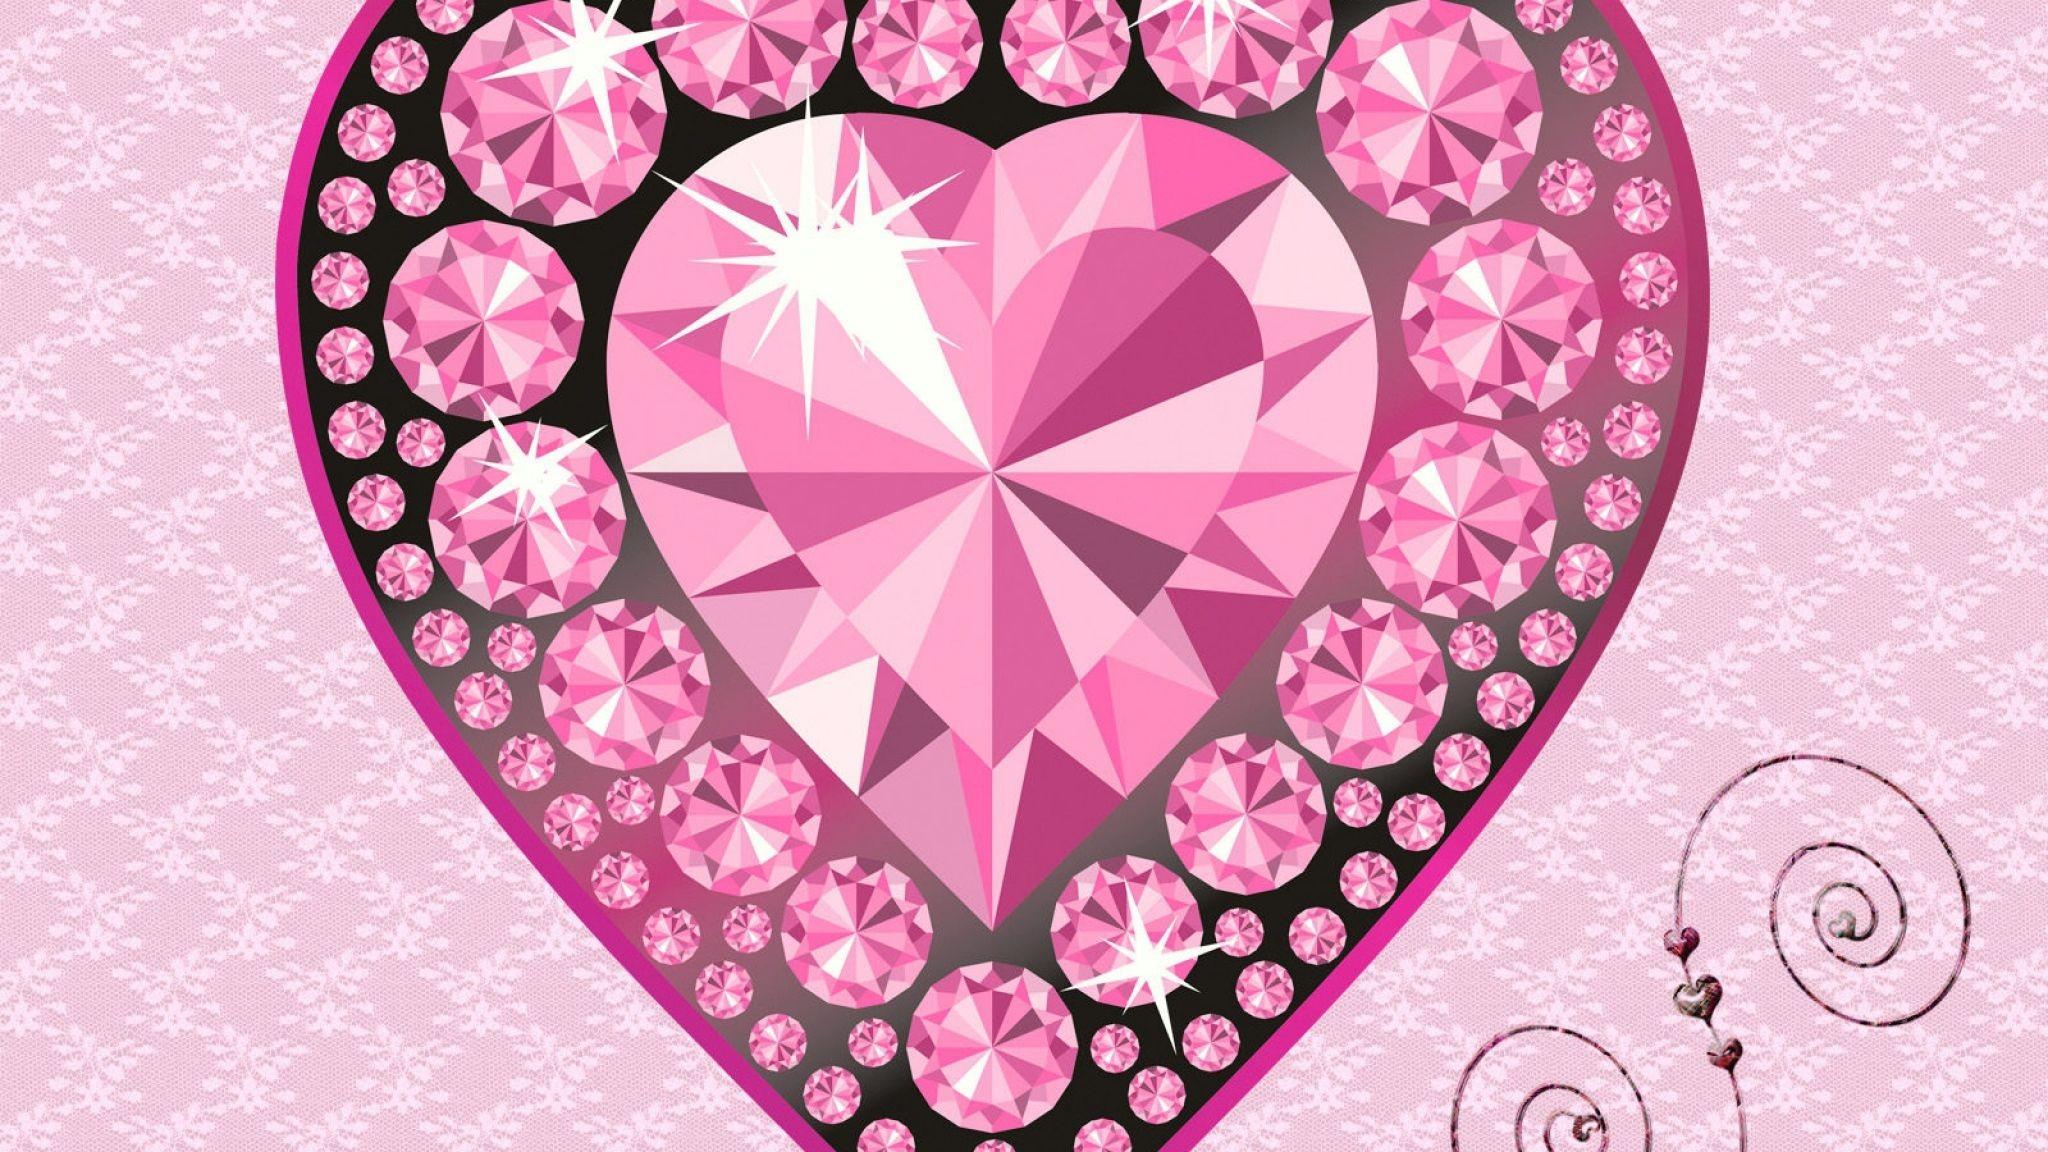 Widescreen-Diamond-Wallpaper-Cool-Image-Pink-Picture.jpg